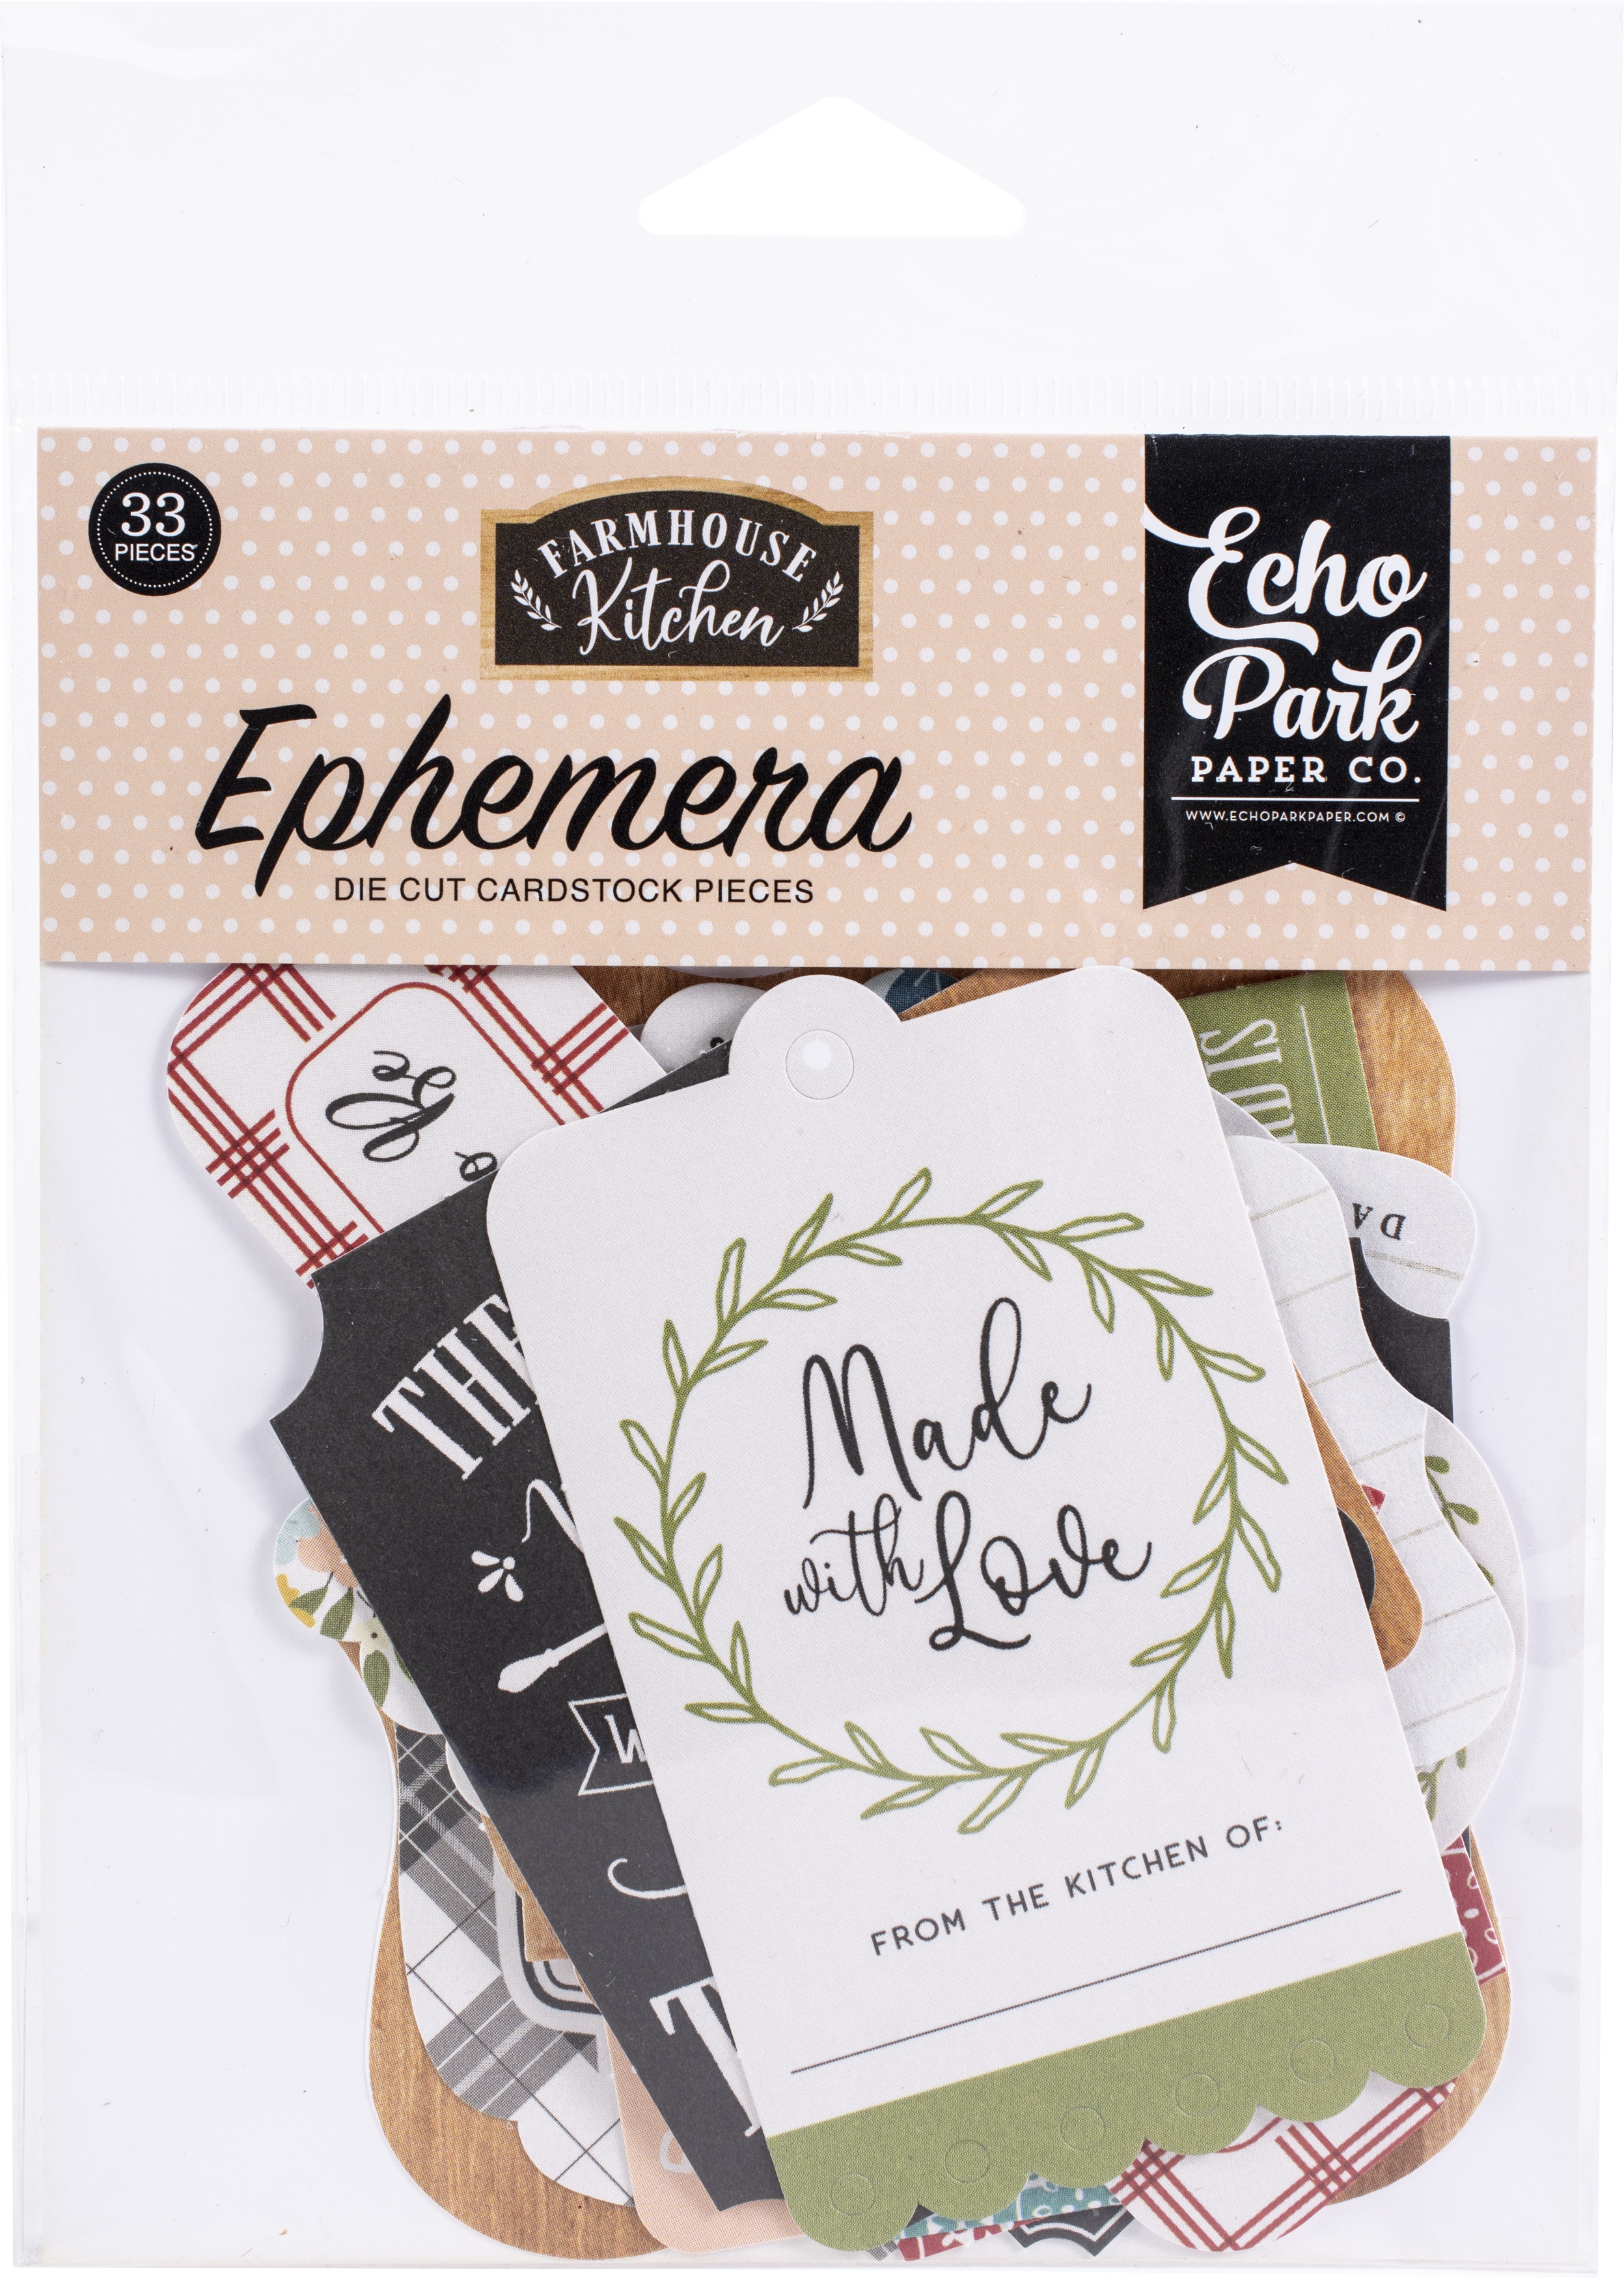 Farmhouse Kitchen - Ephemera Die Cut Cardstock Pieces (Echo Park)